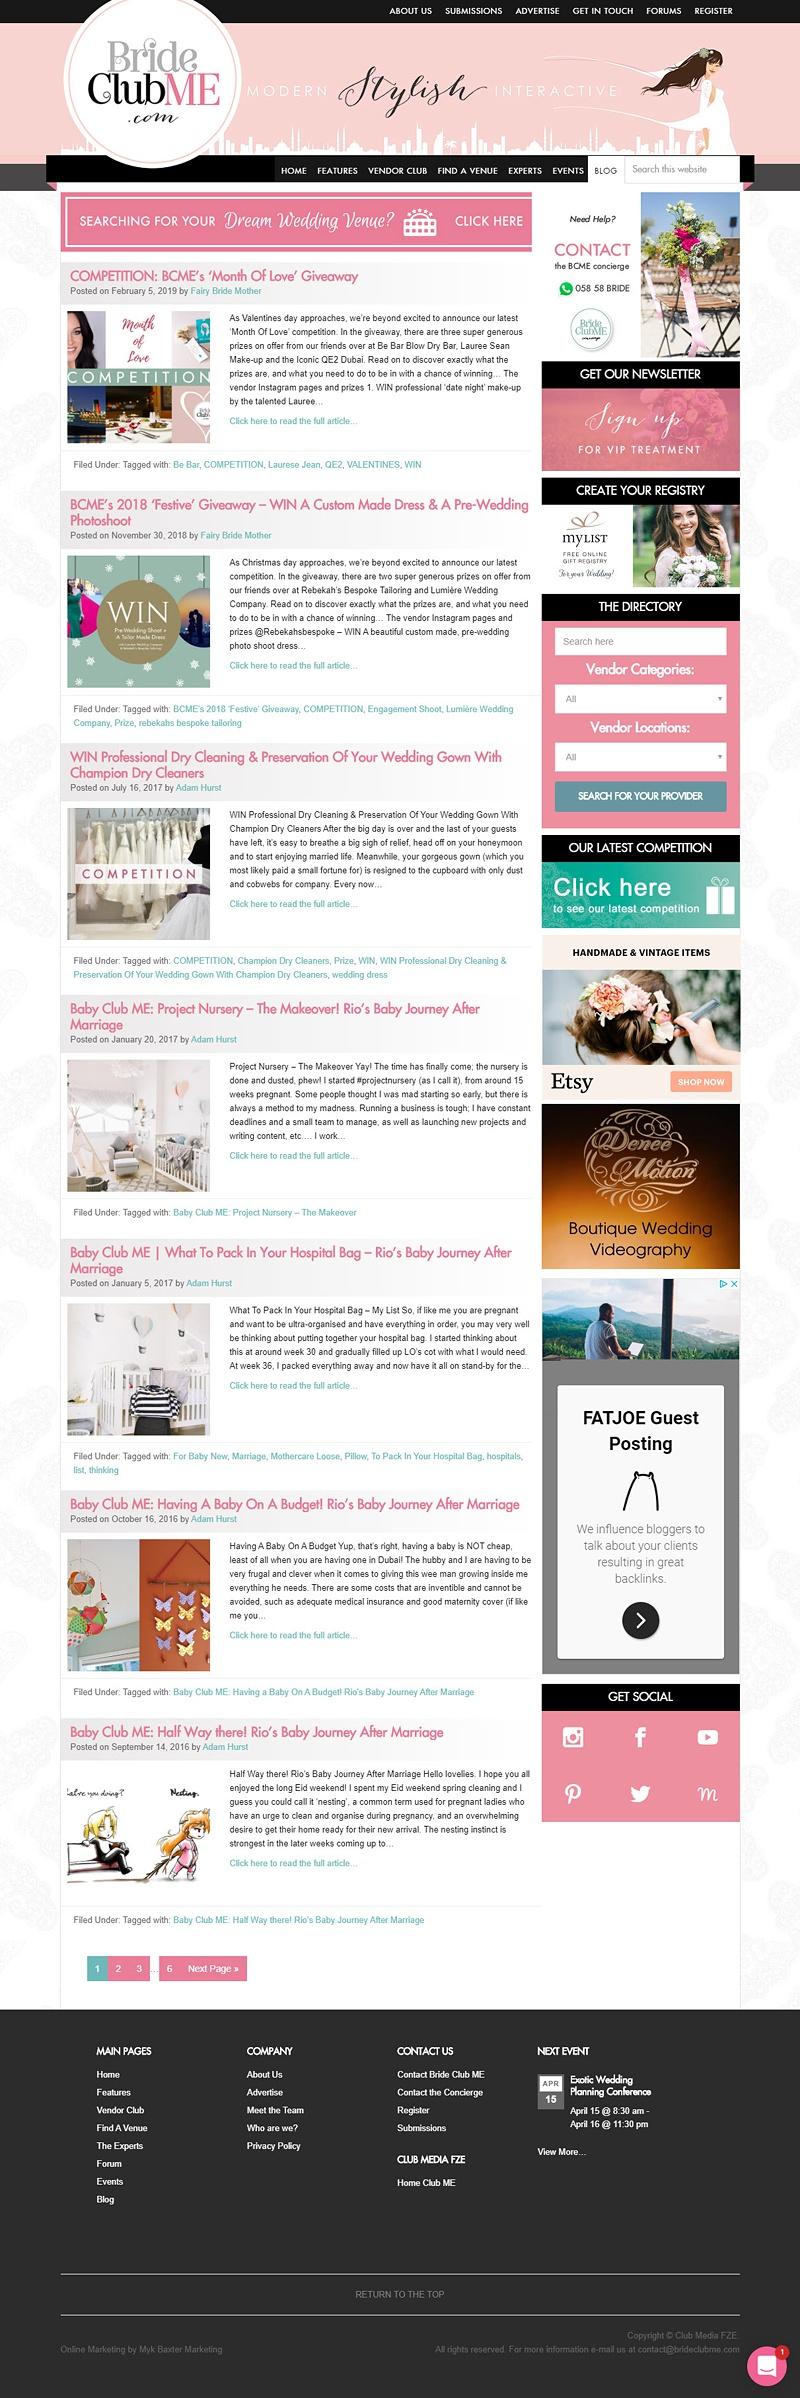 BrideClubMe Blog